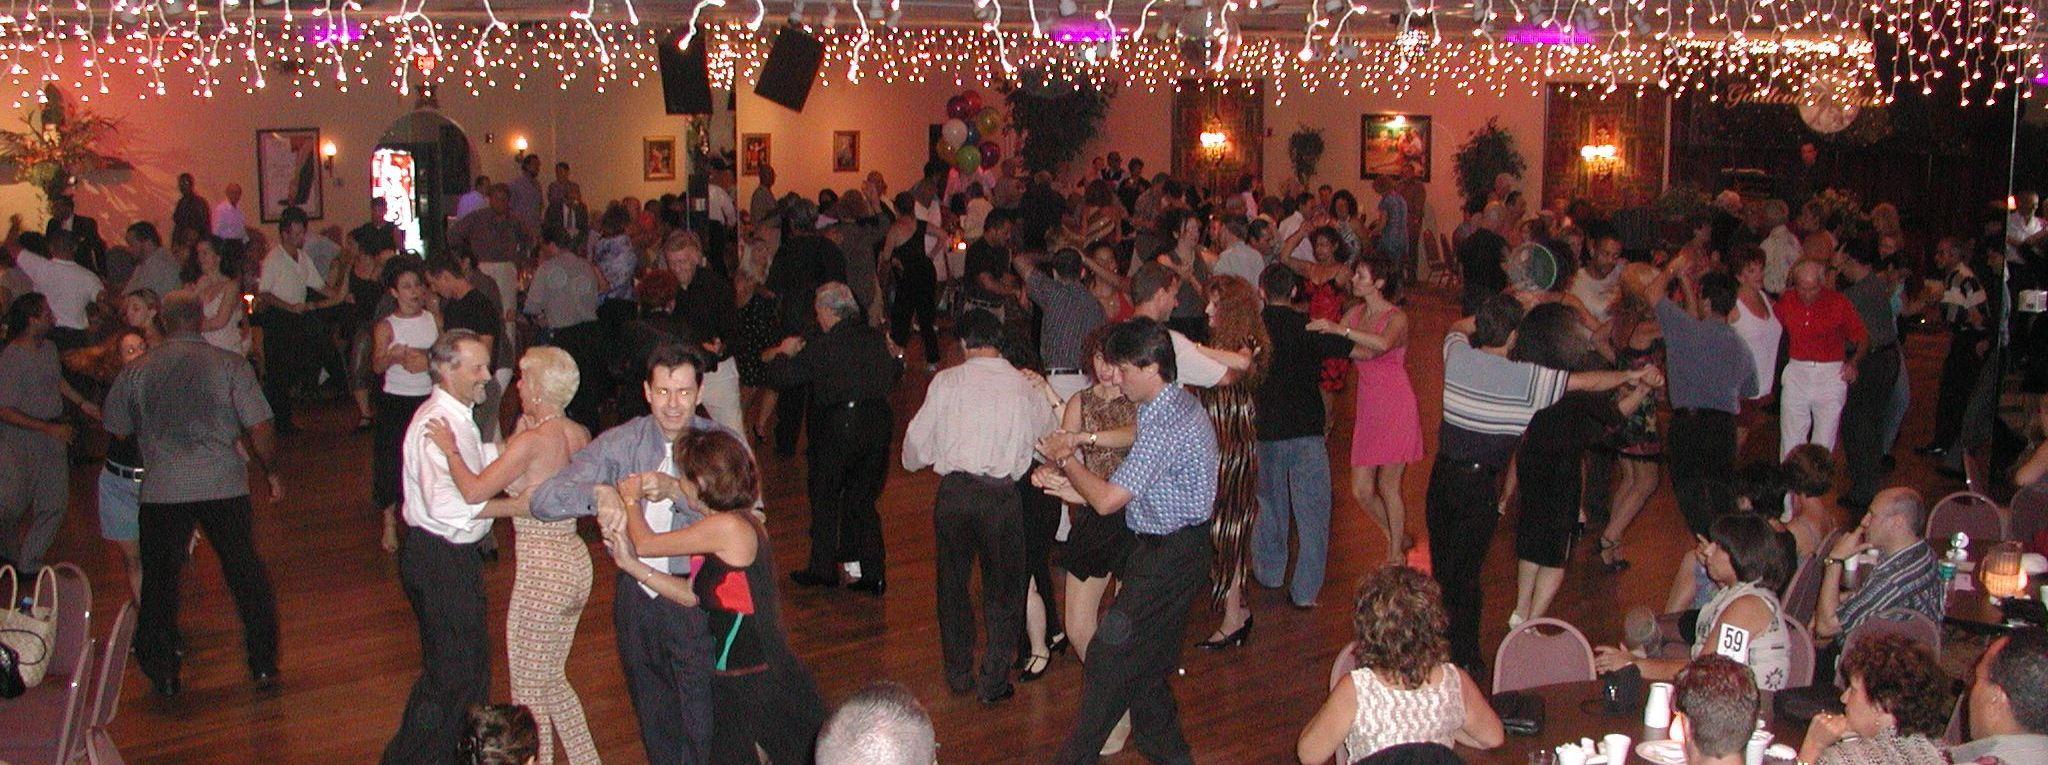 Tuesday Evenings at Goldcoast Ballroom – Ballroom DanceSport Night – including a COMPLIMENTARY DANCE CLASS (usually with U.S. Professional Champion Liene Di Lorenzo!!!)